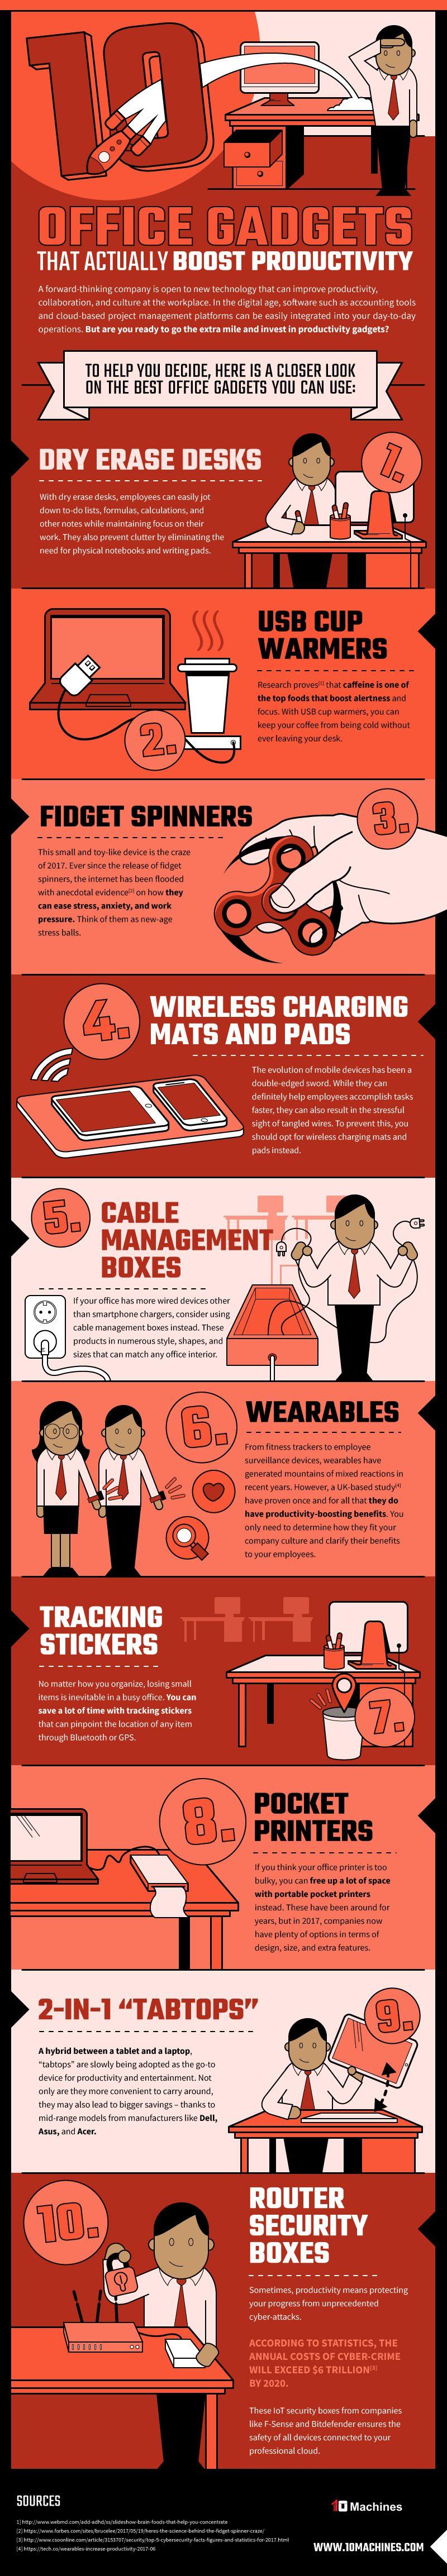 10_Office_Gadgets_IG-1